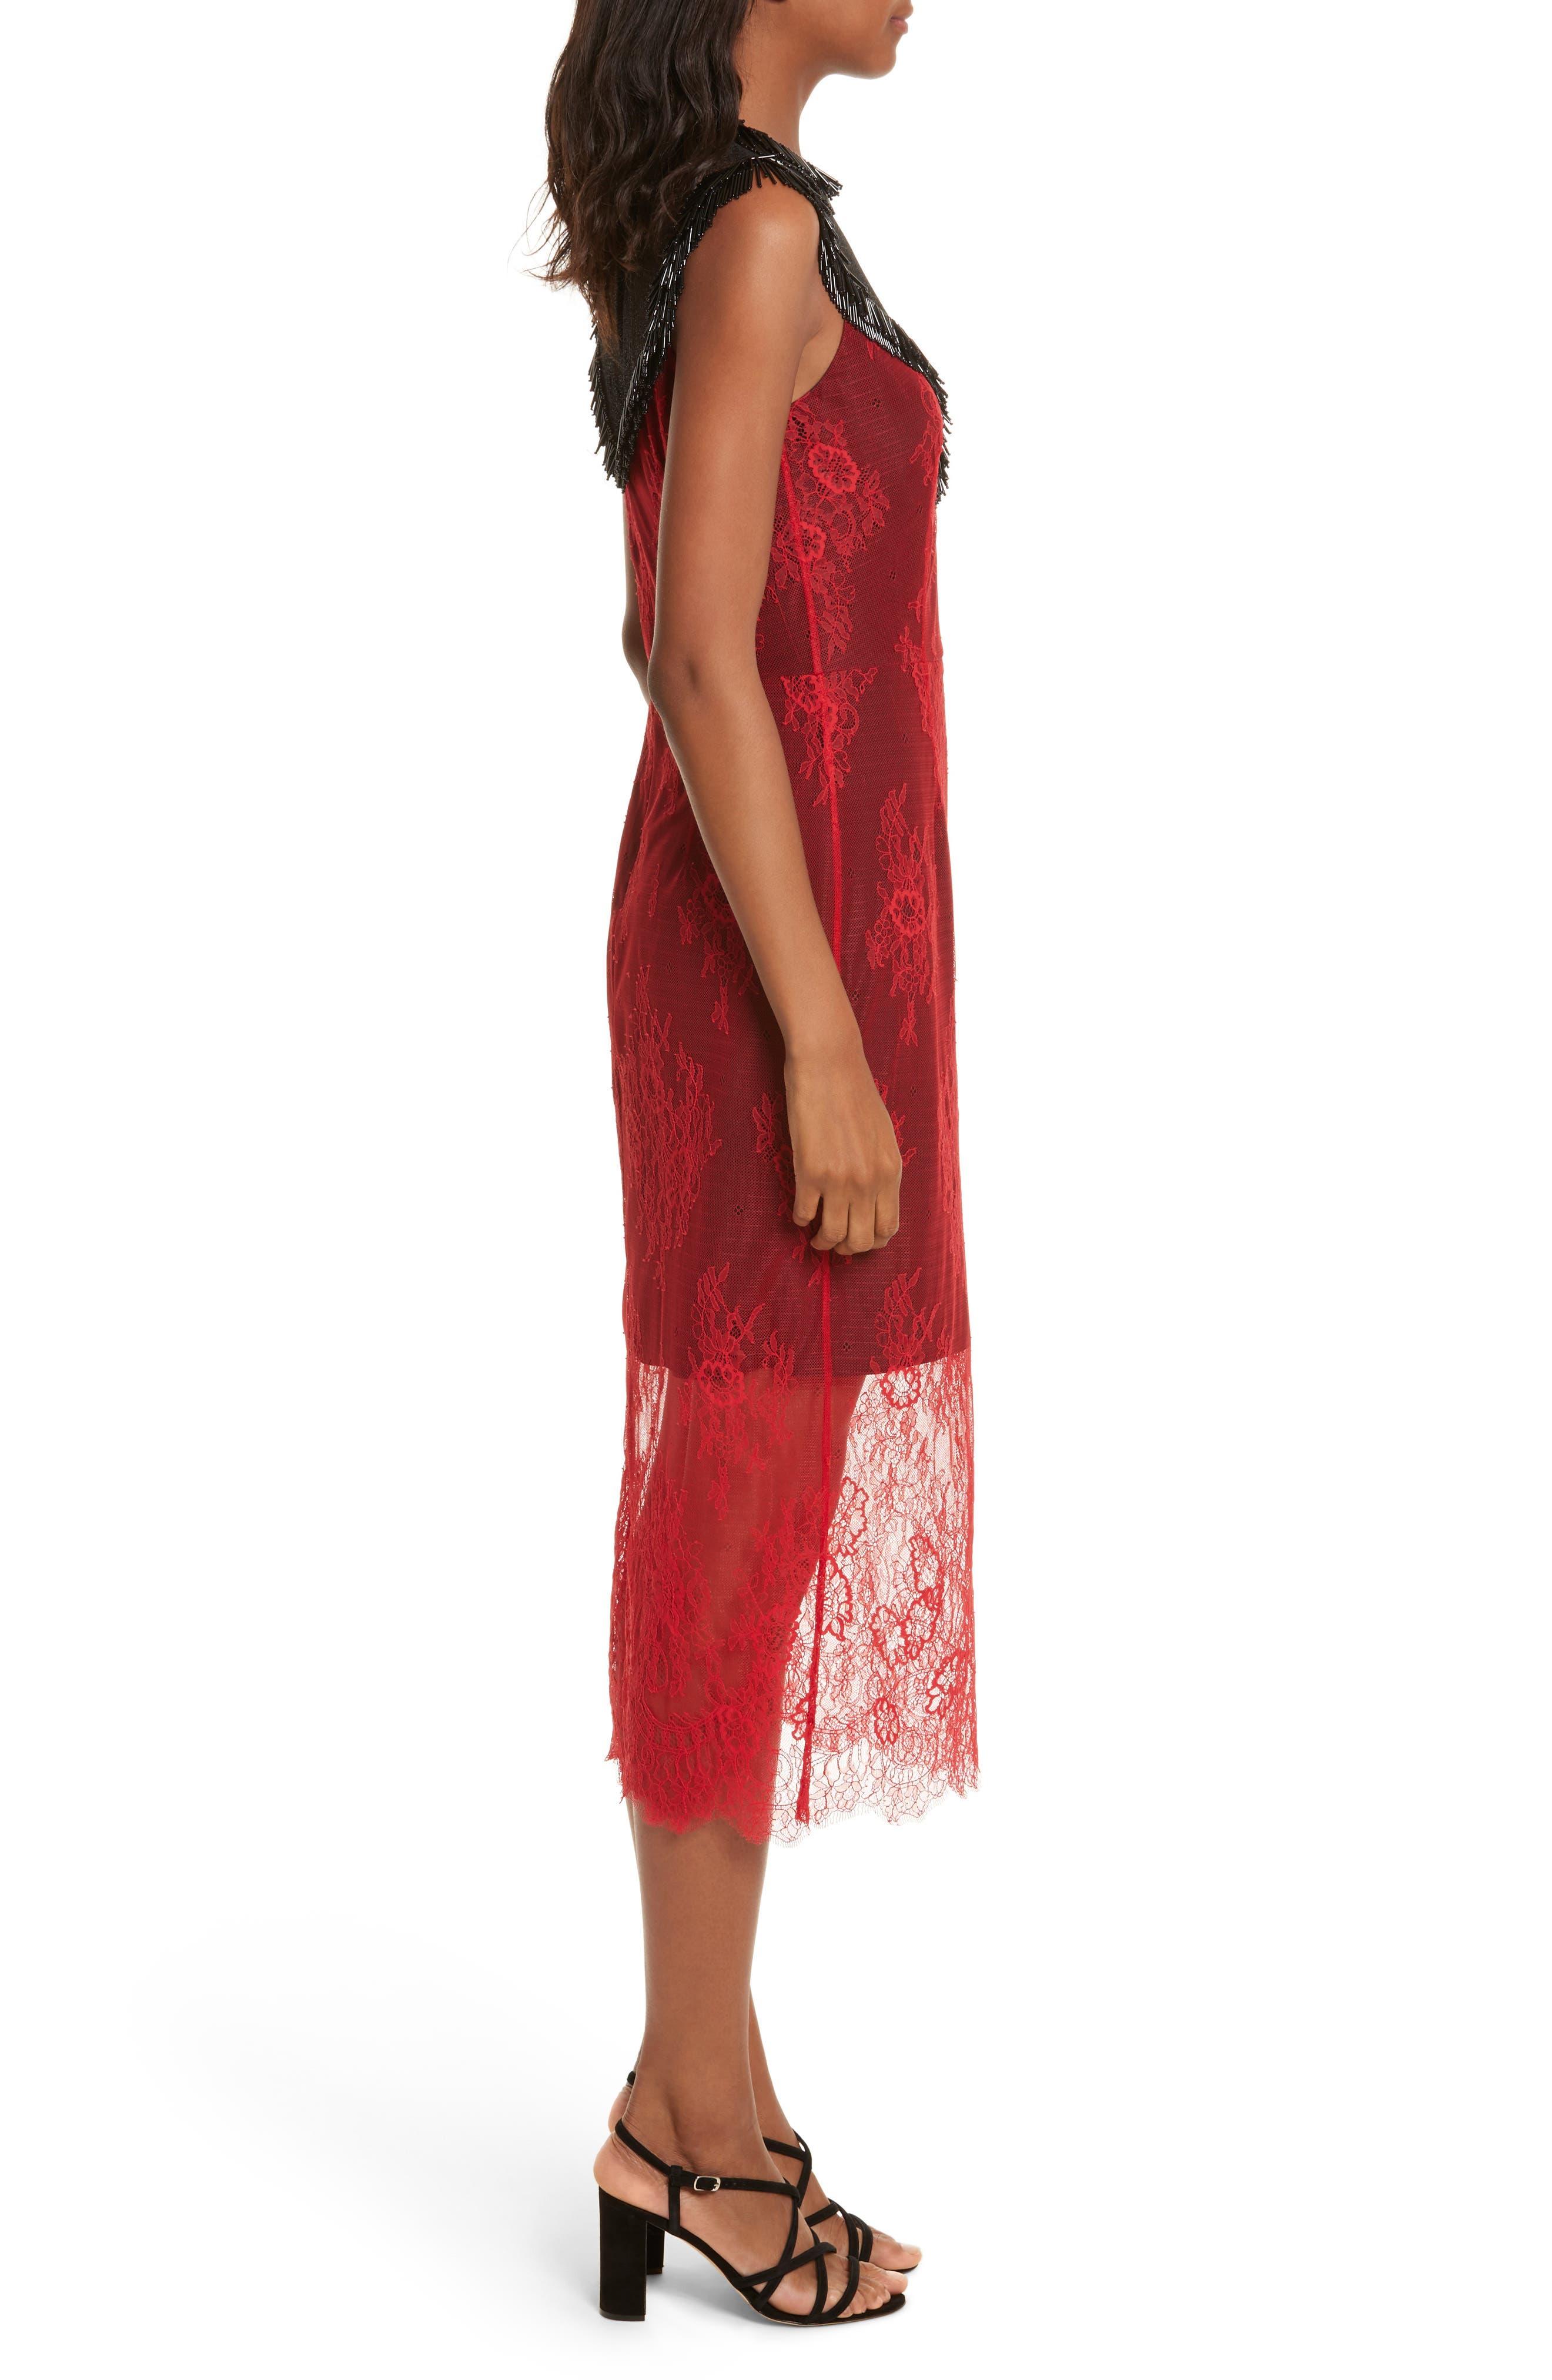 Diane von Furstenberg Beaded Lace Overlay Dress,                             Alternate thumbnail 3, color,                             Lipstick/ Black